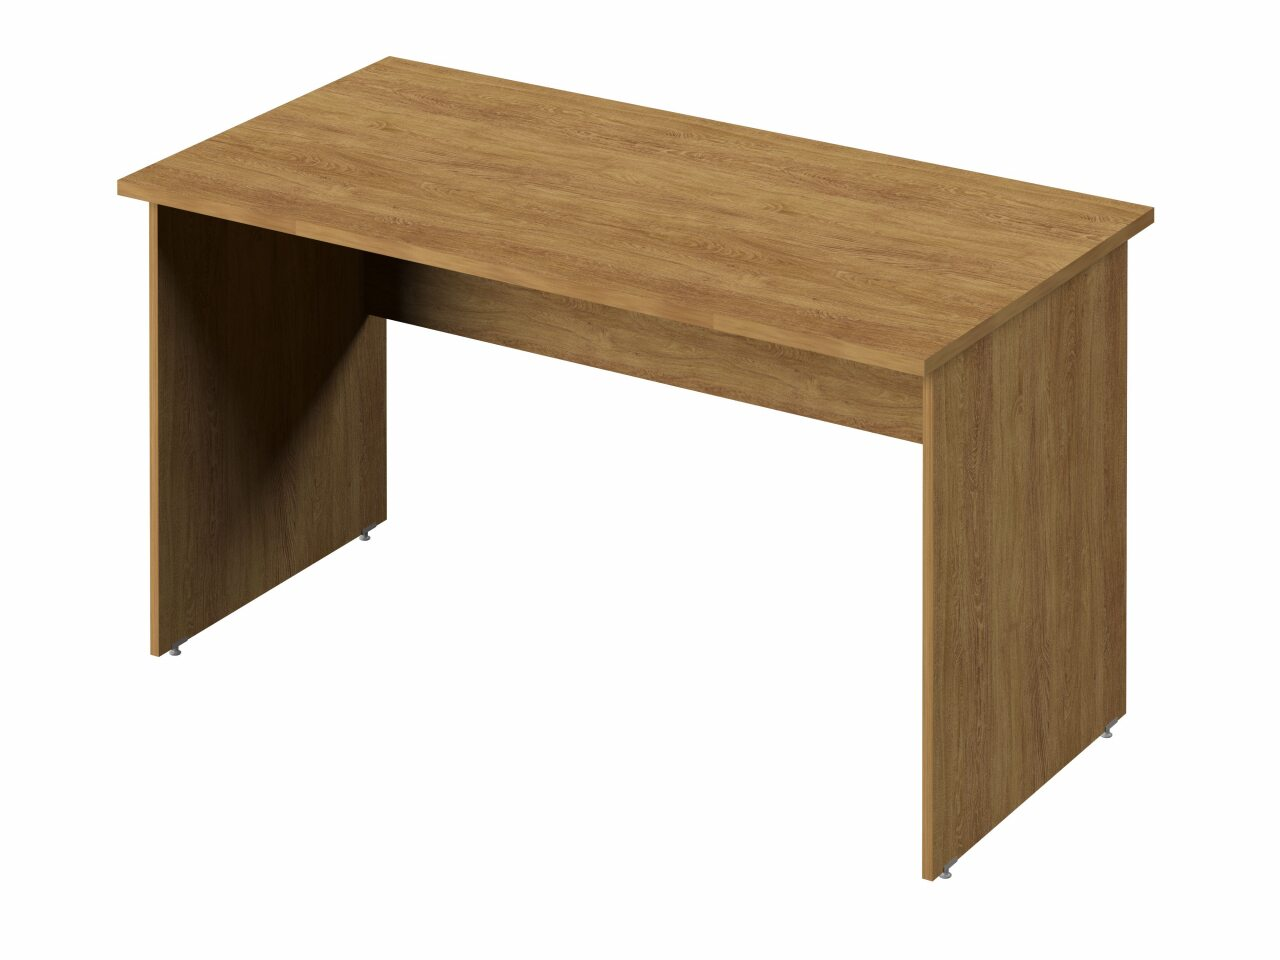 Стол прямой с опорами из ЛДСП  Public Comfort 135x70x74 - фото 4